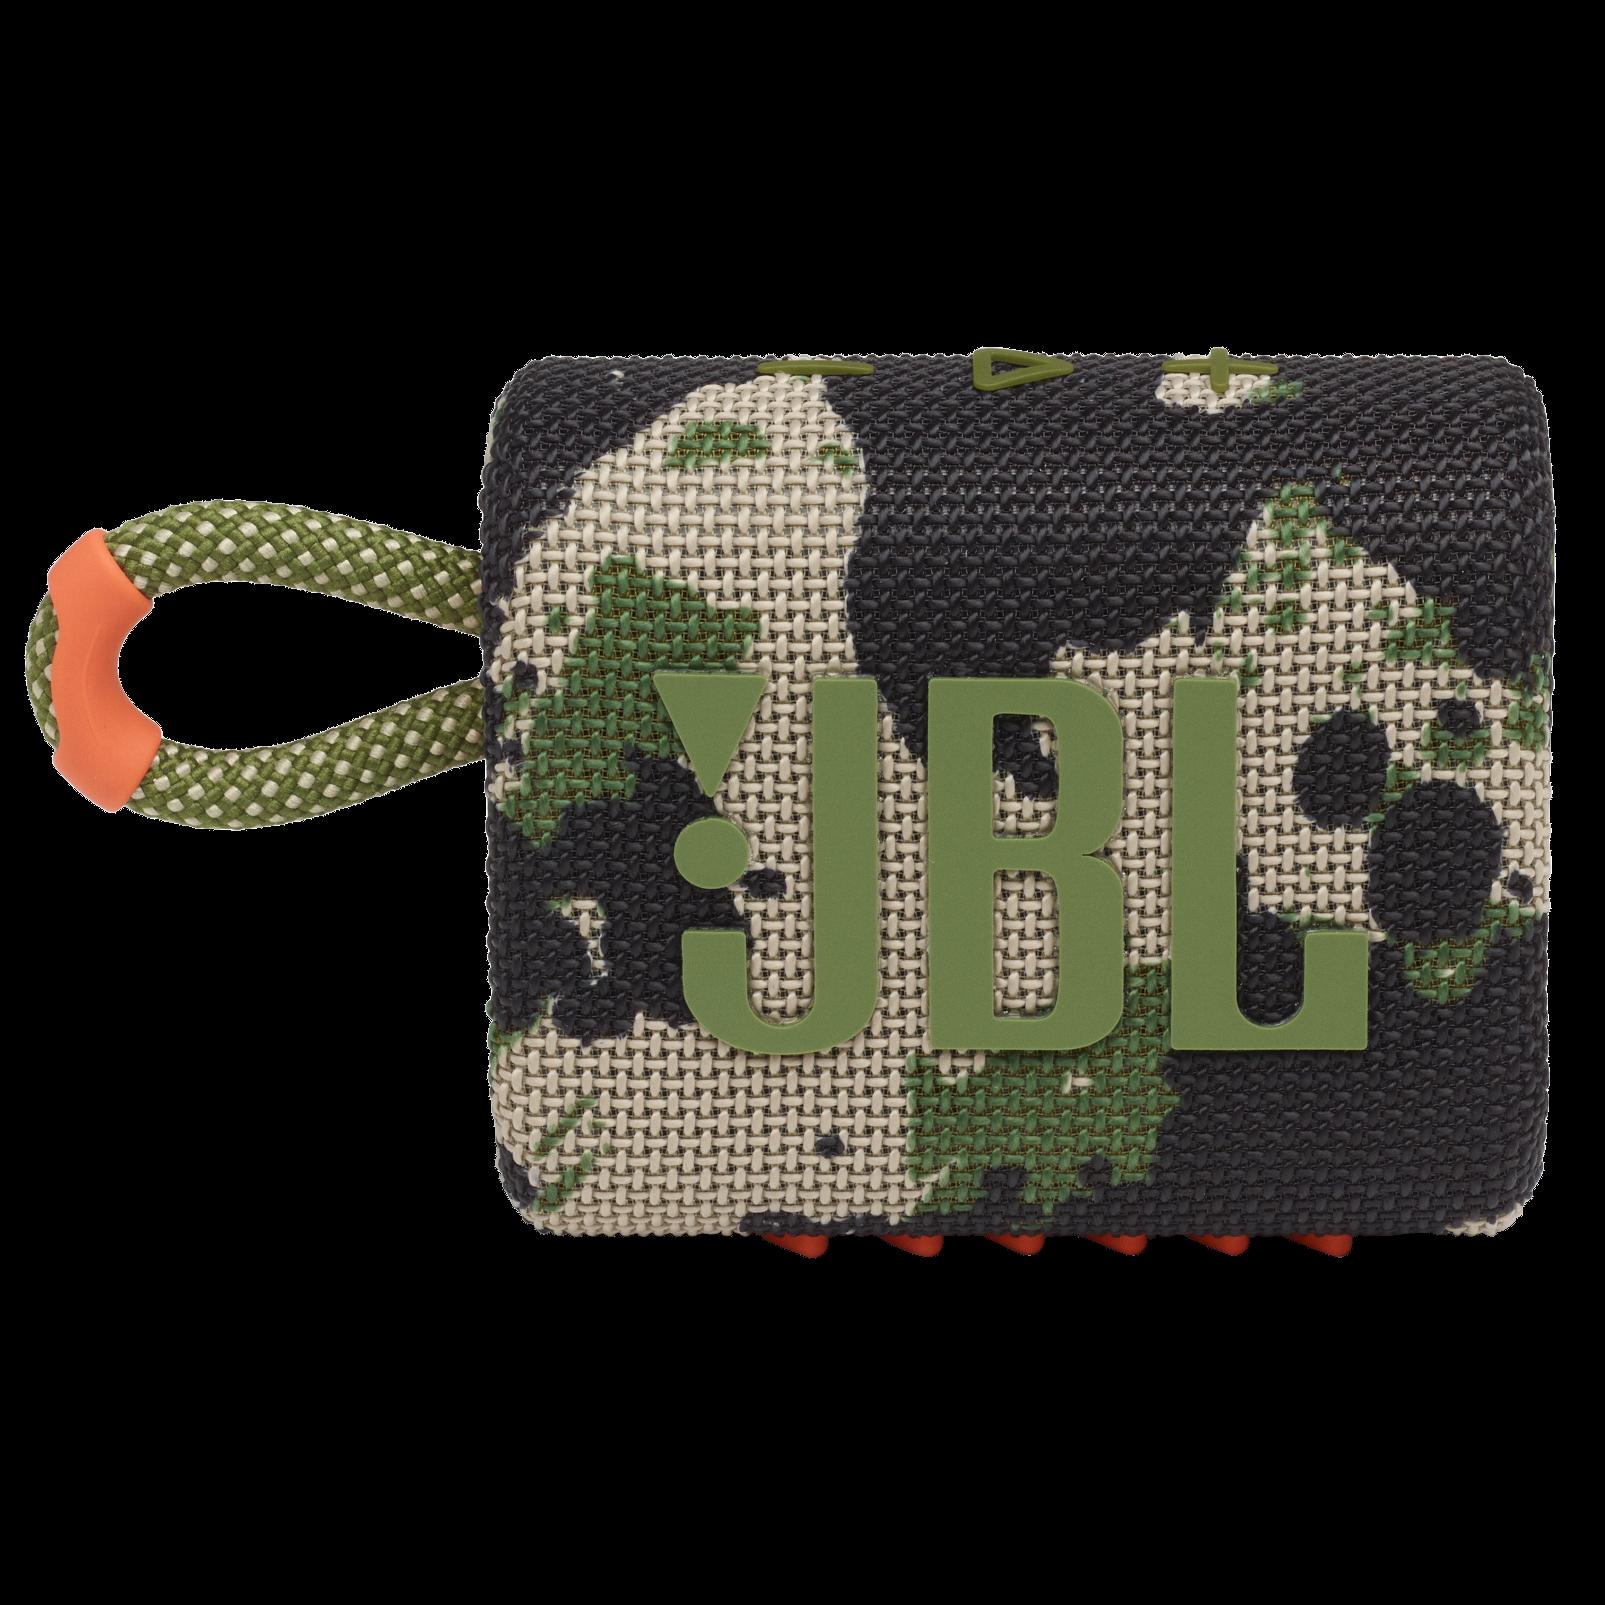 JBL Go 3 - Squad - Portable Waterproof Speaker - Front